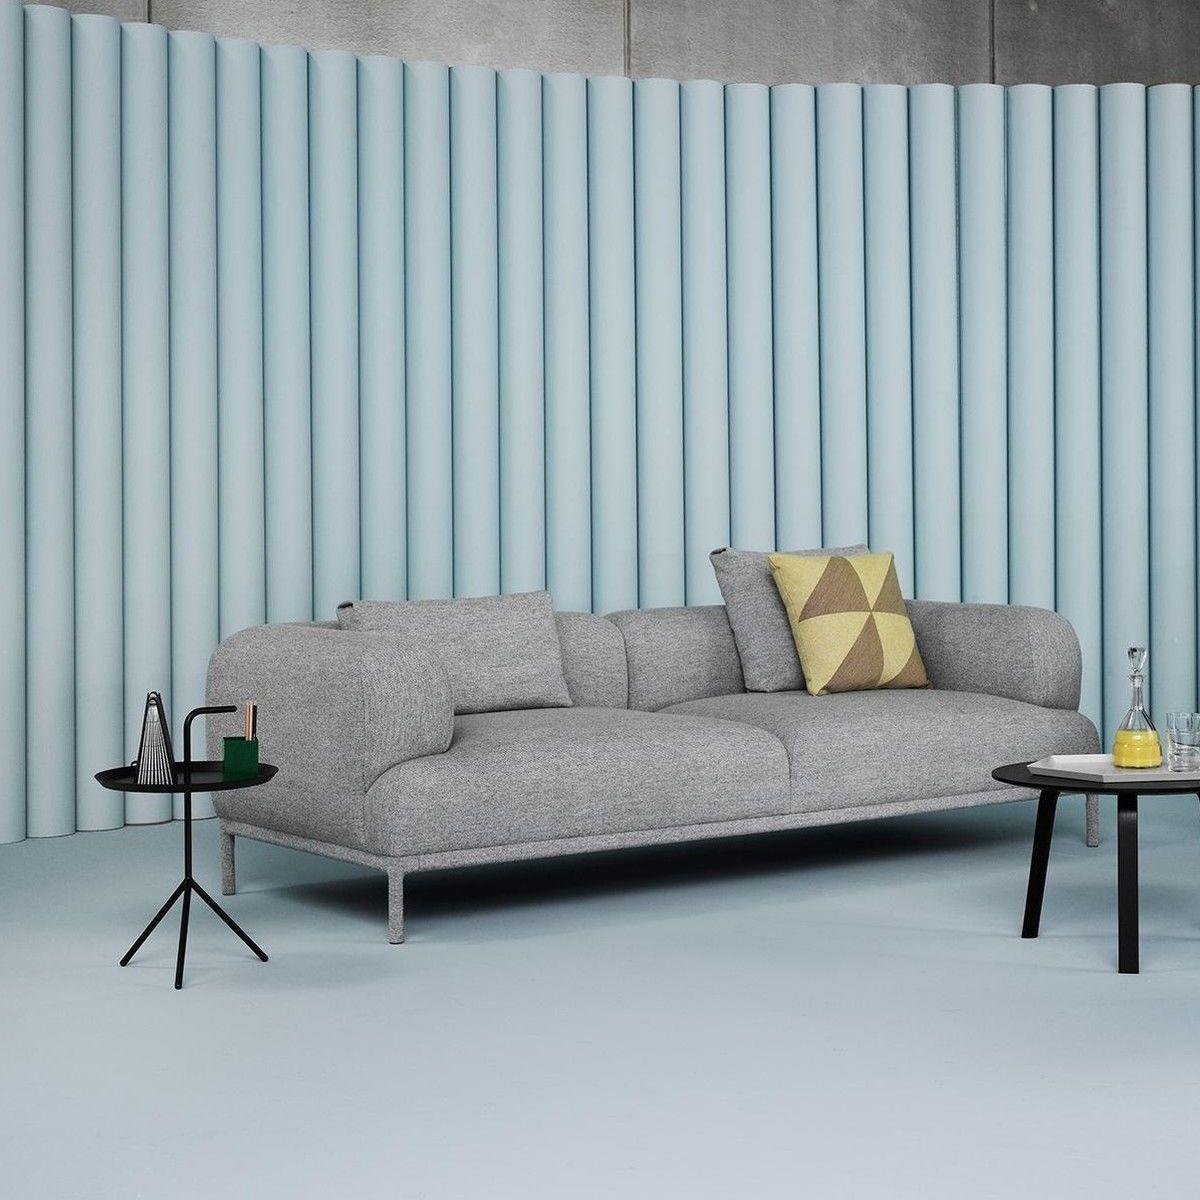 bj rn 3 seater sofa hay. Black Bedroom Furniture Sets. Home Design Ideas